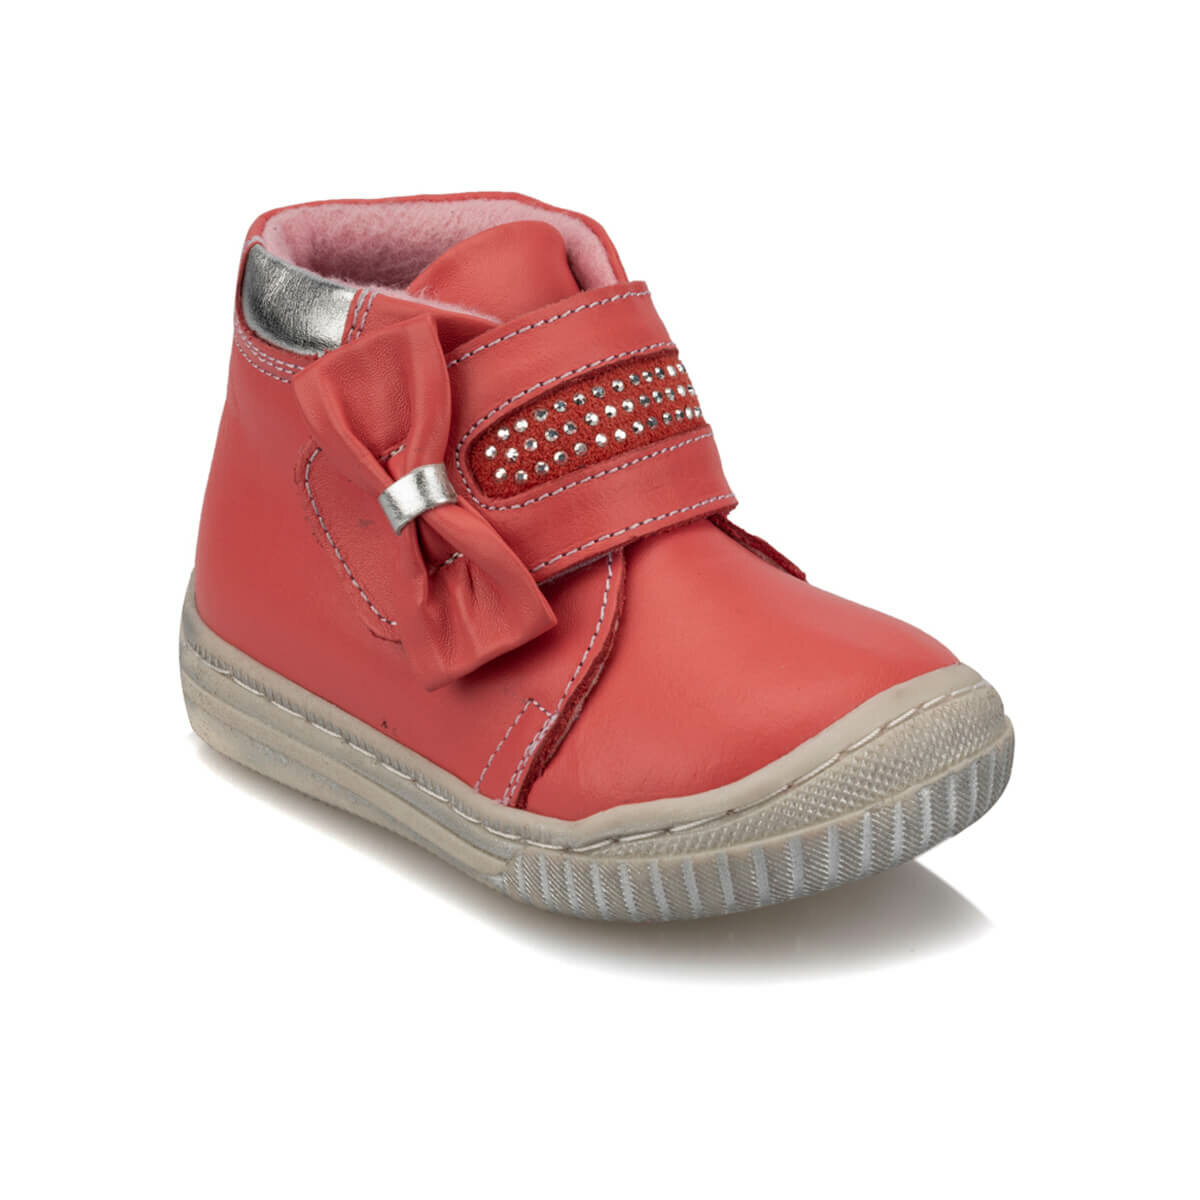 FLO 92.511745.I Coral Female Child Sneaker Shoes Polaris